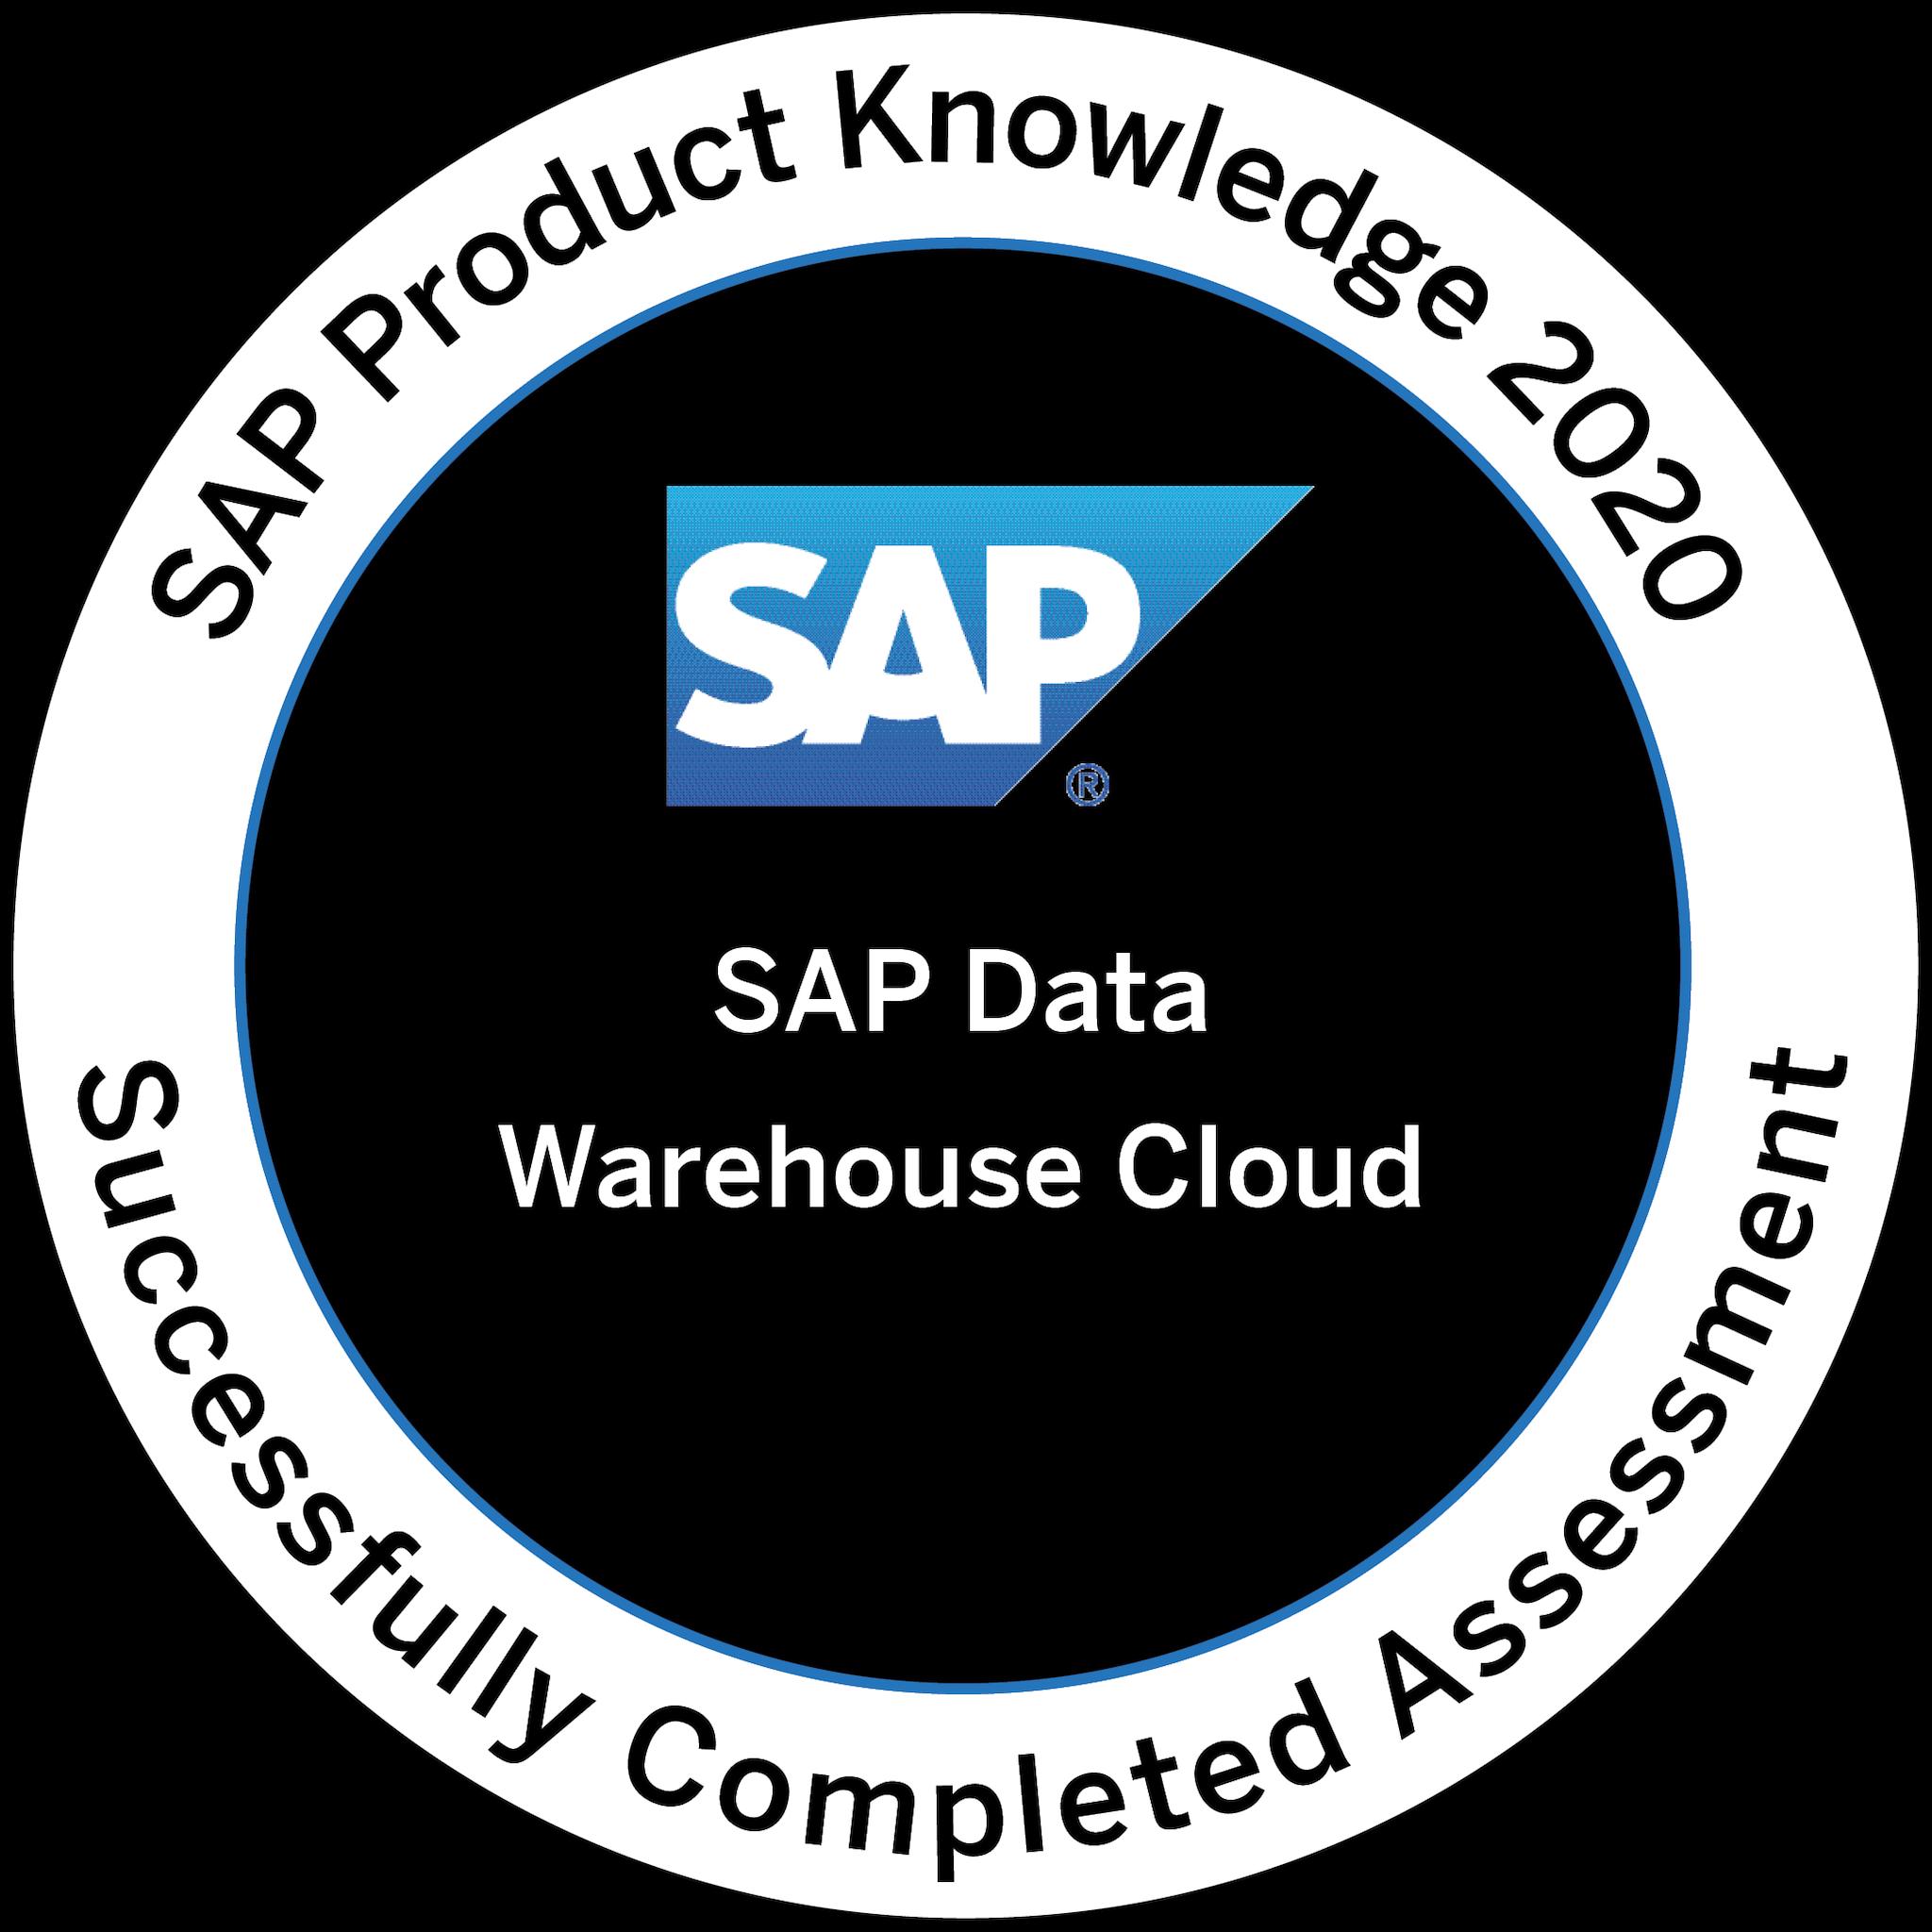 SAP Product Knowledge 2020 - SAP Data Warehouse Cloud